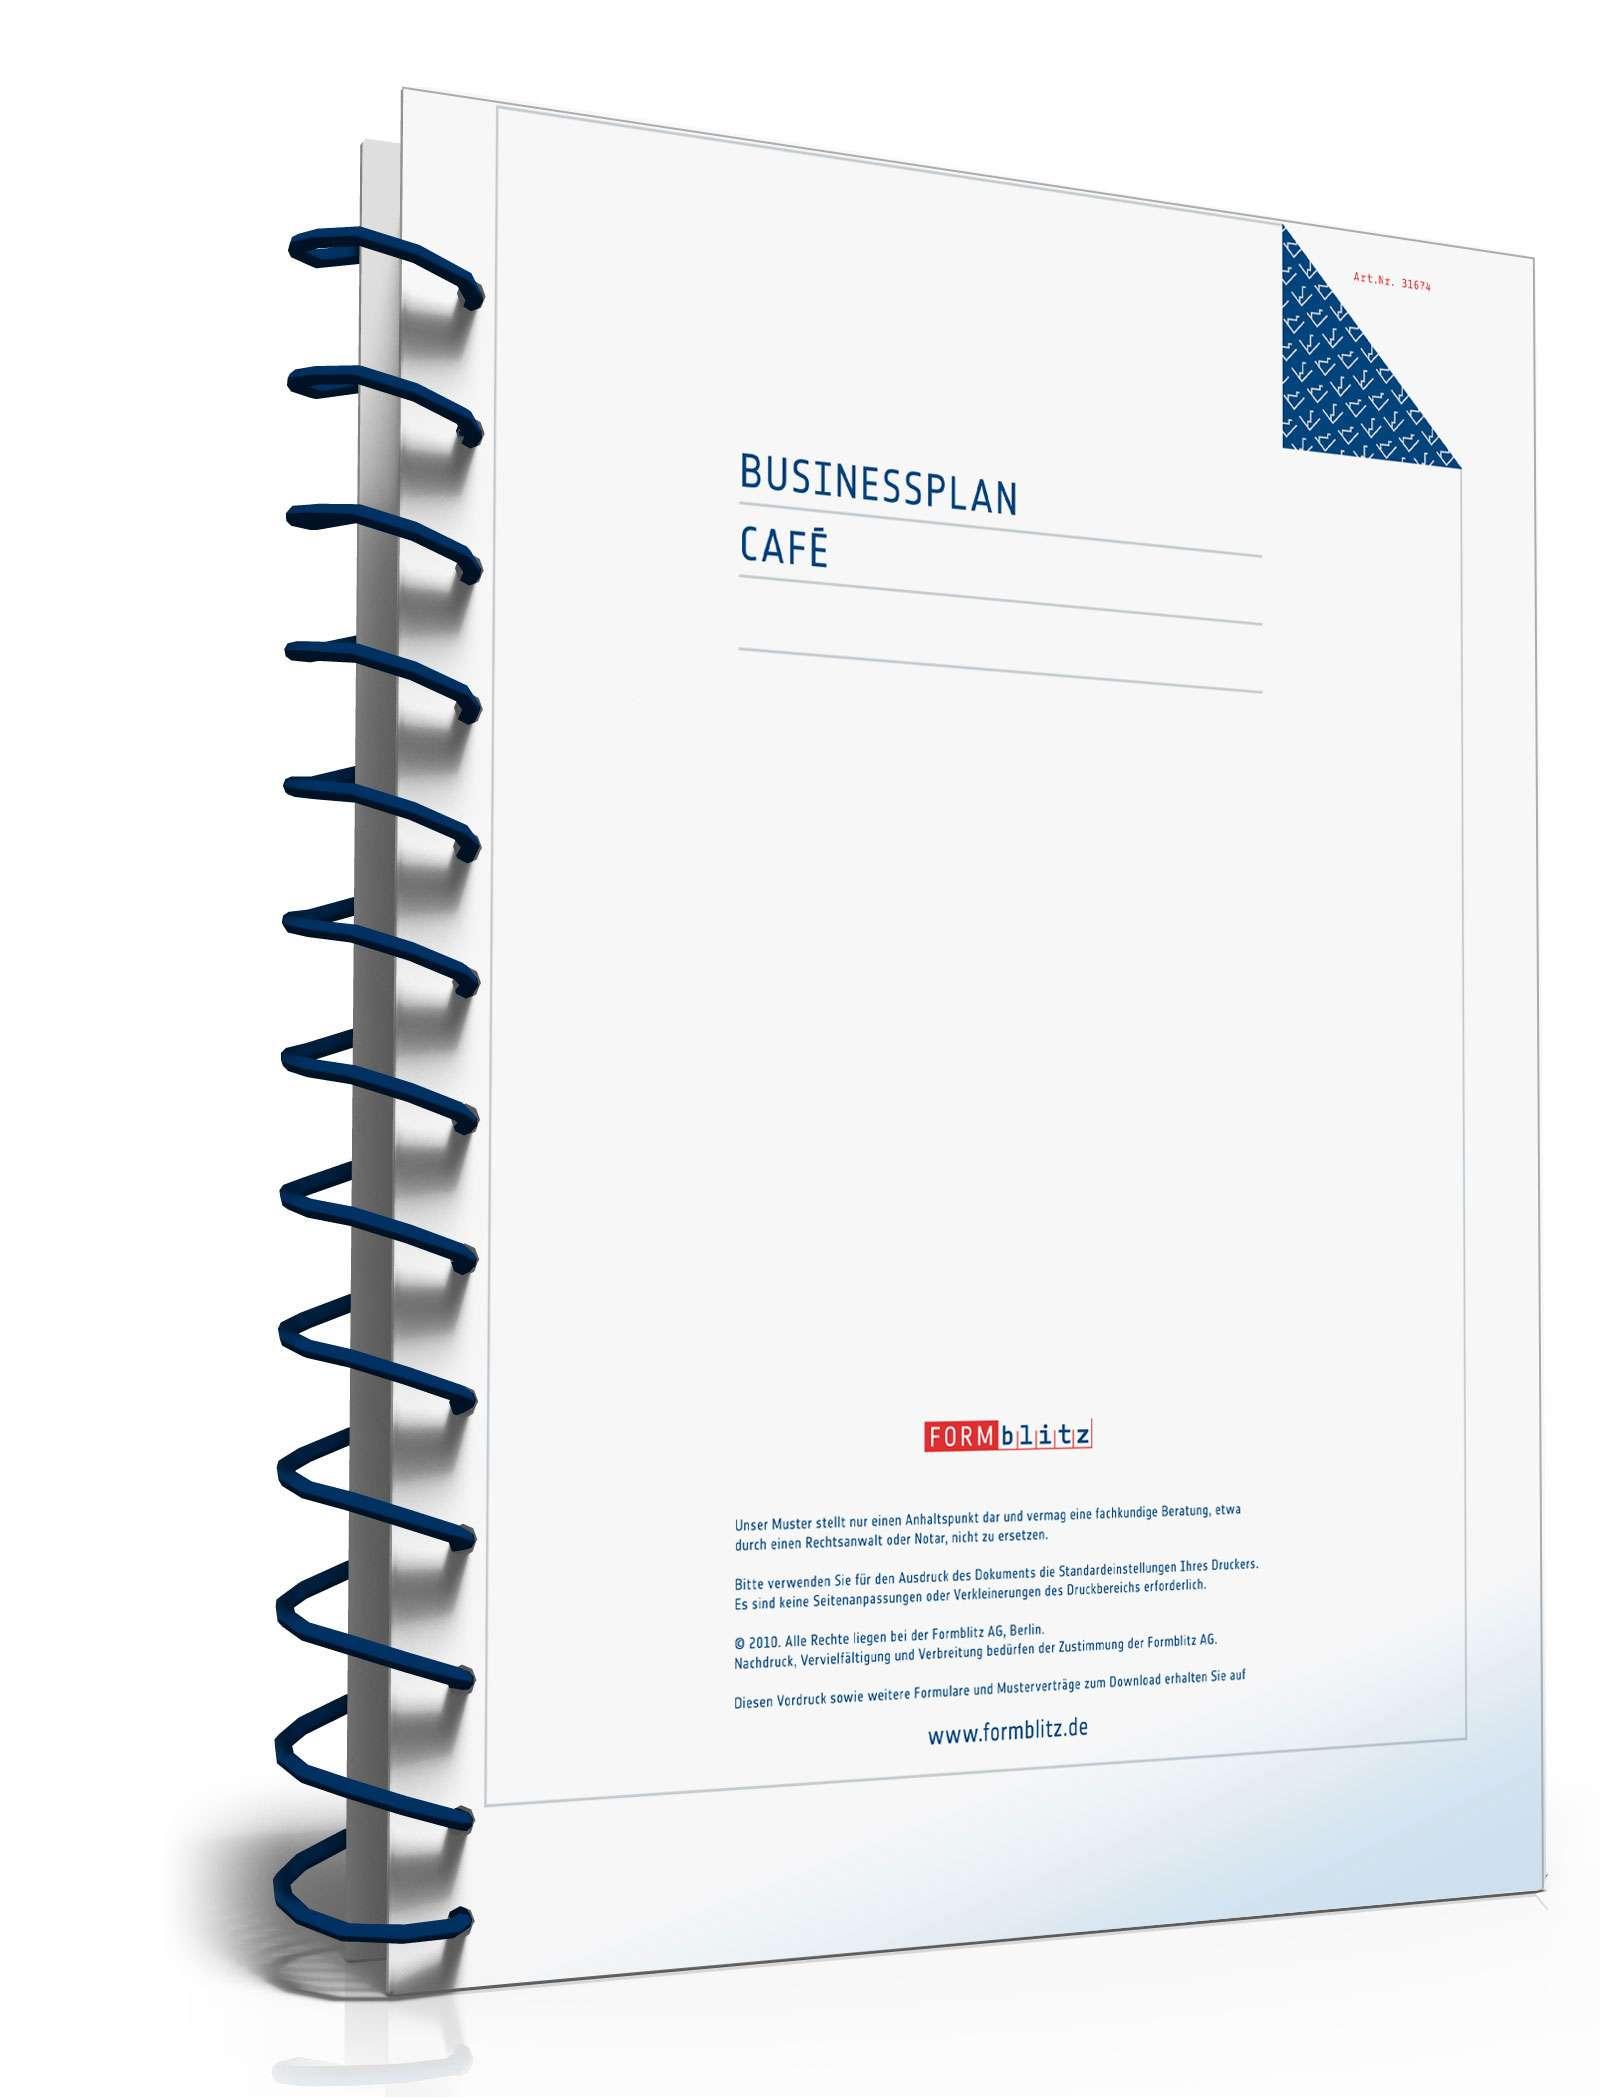 Businessplan Café: Muster aus Profihand zum Download